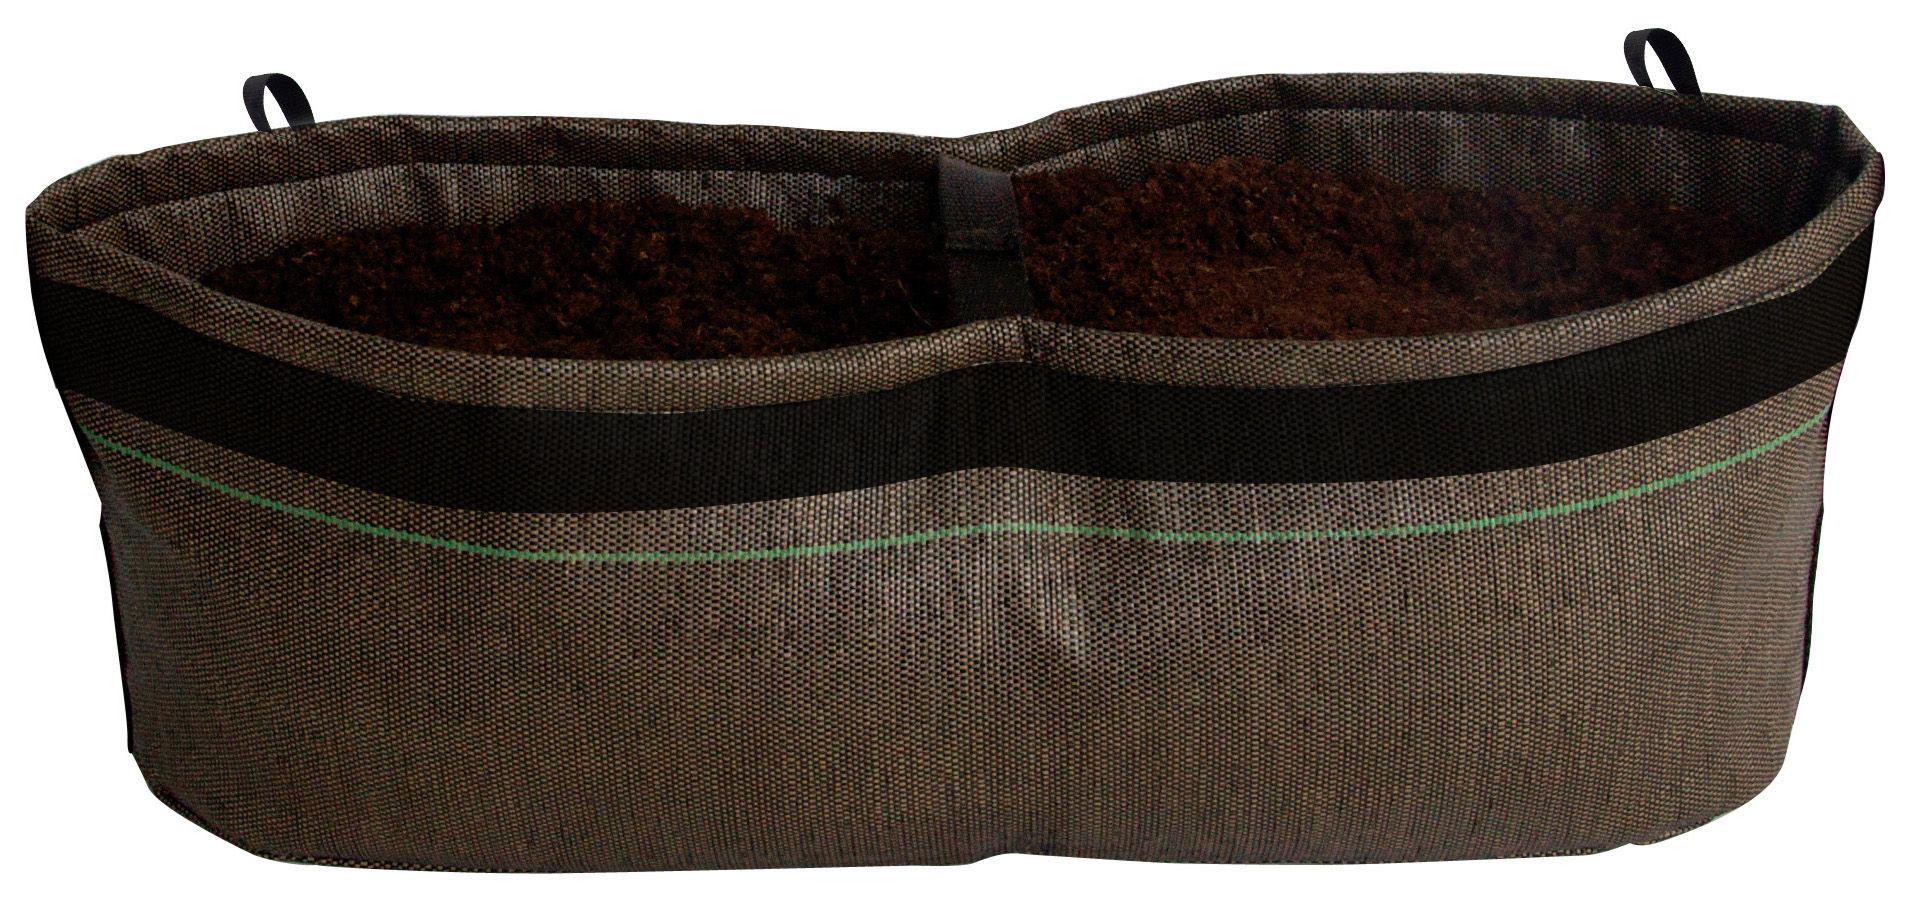 jardini re geotextile outdoor 14 litres 14 litres marron bacsac. Black Bedroom Furniture Sets. Home Design Ideas